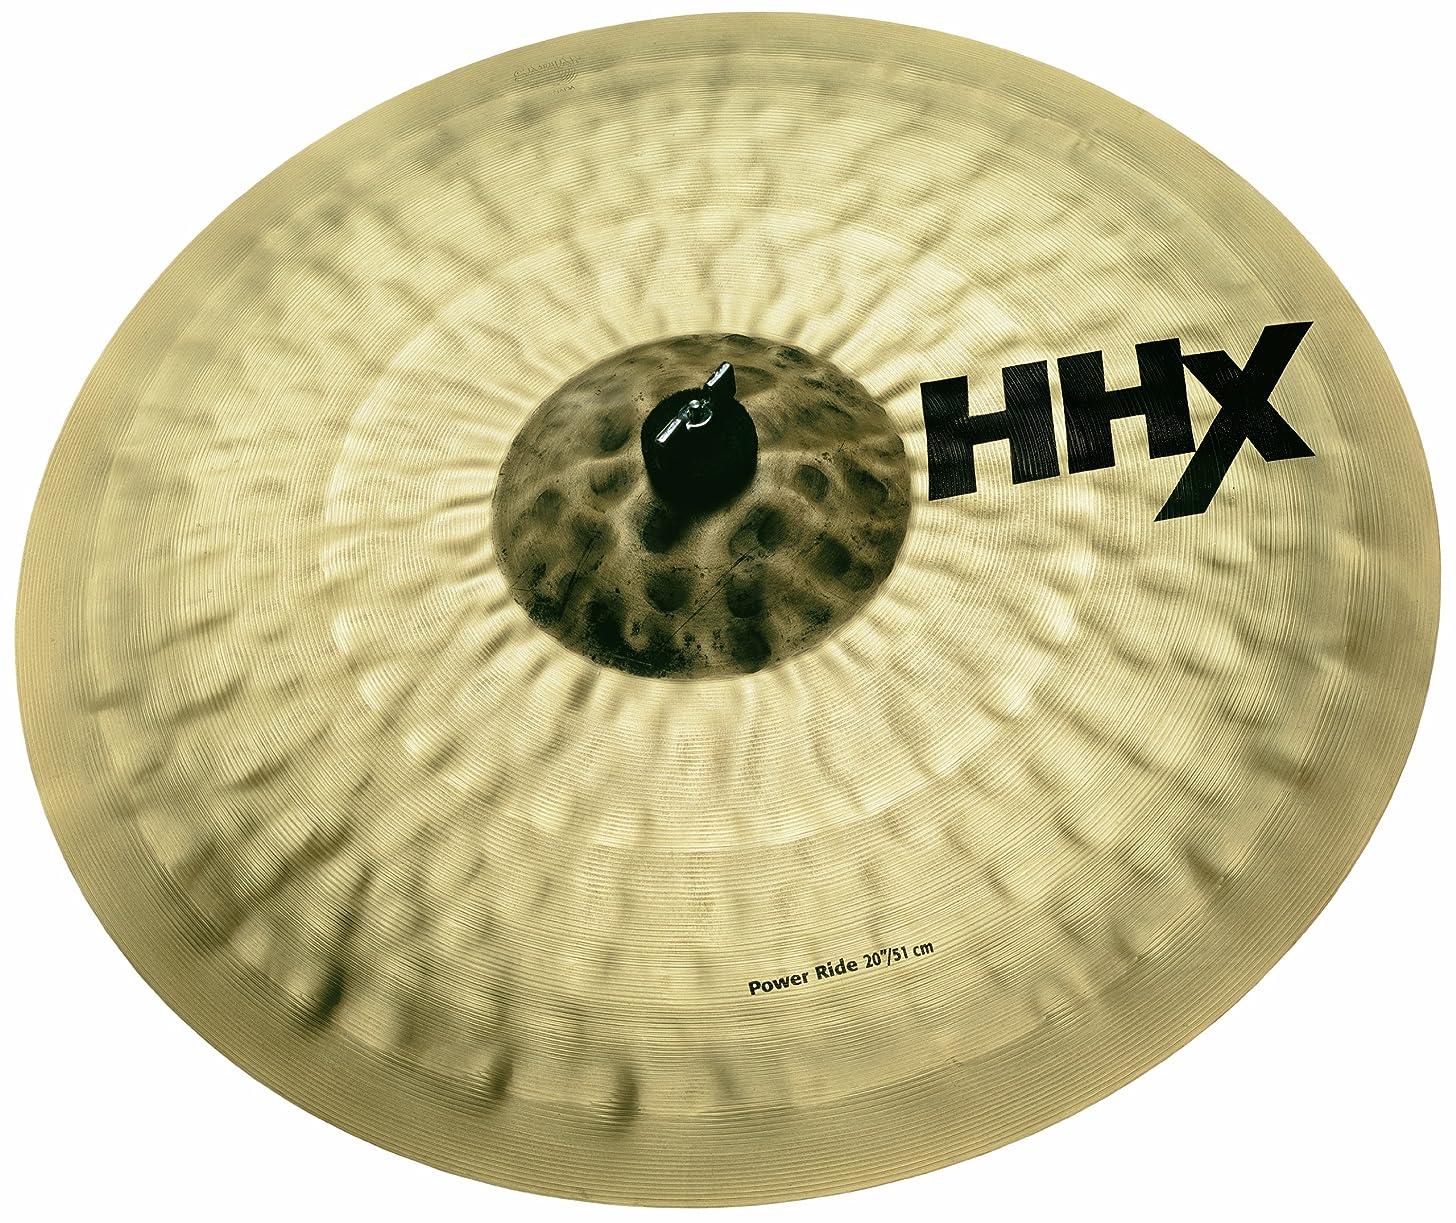 Sabian 20 Inch HHX Power Ride Cymbal